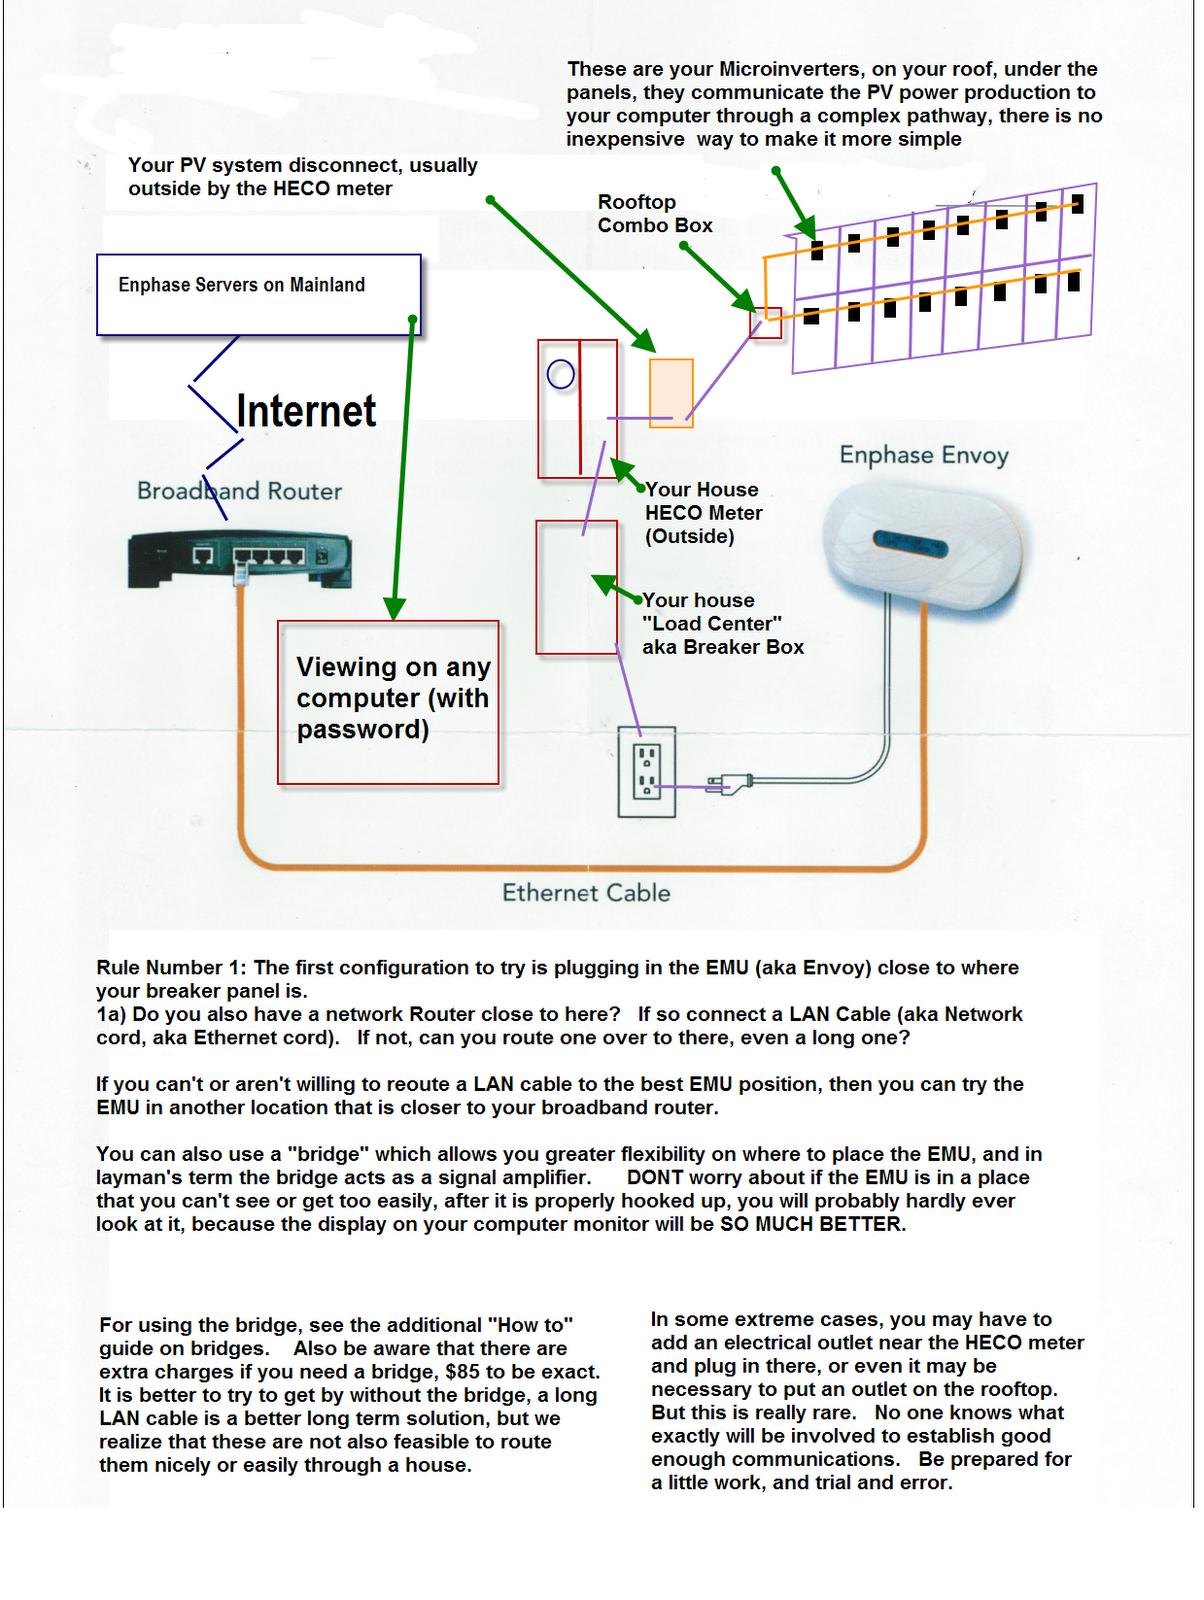 How Gfci Works Single Wiring Diagram Pacific Energy Strategies Llc Emu Envoy To Hook Up And Bridge Also Circuit Breaker Vs Receptacle